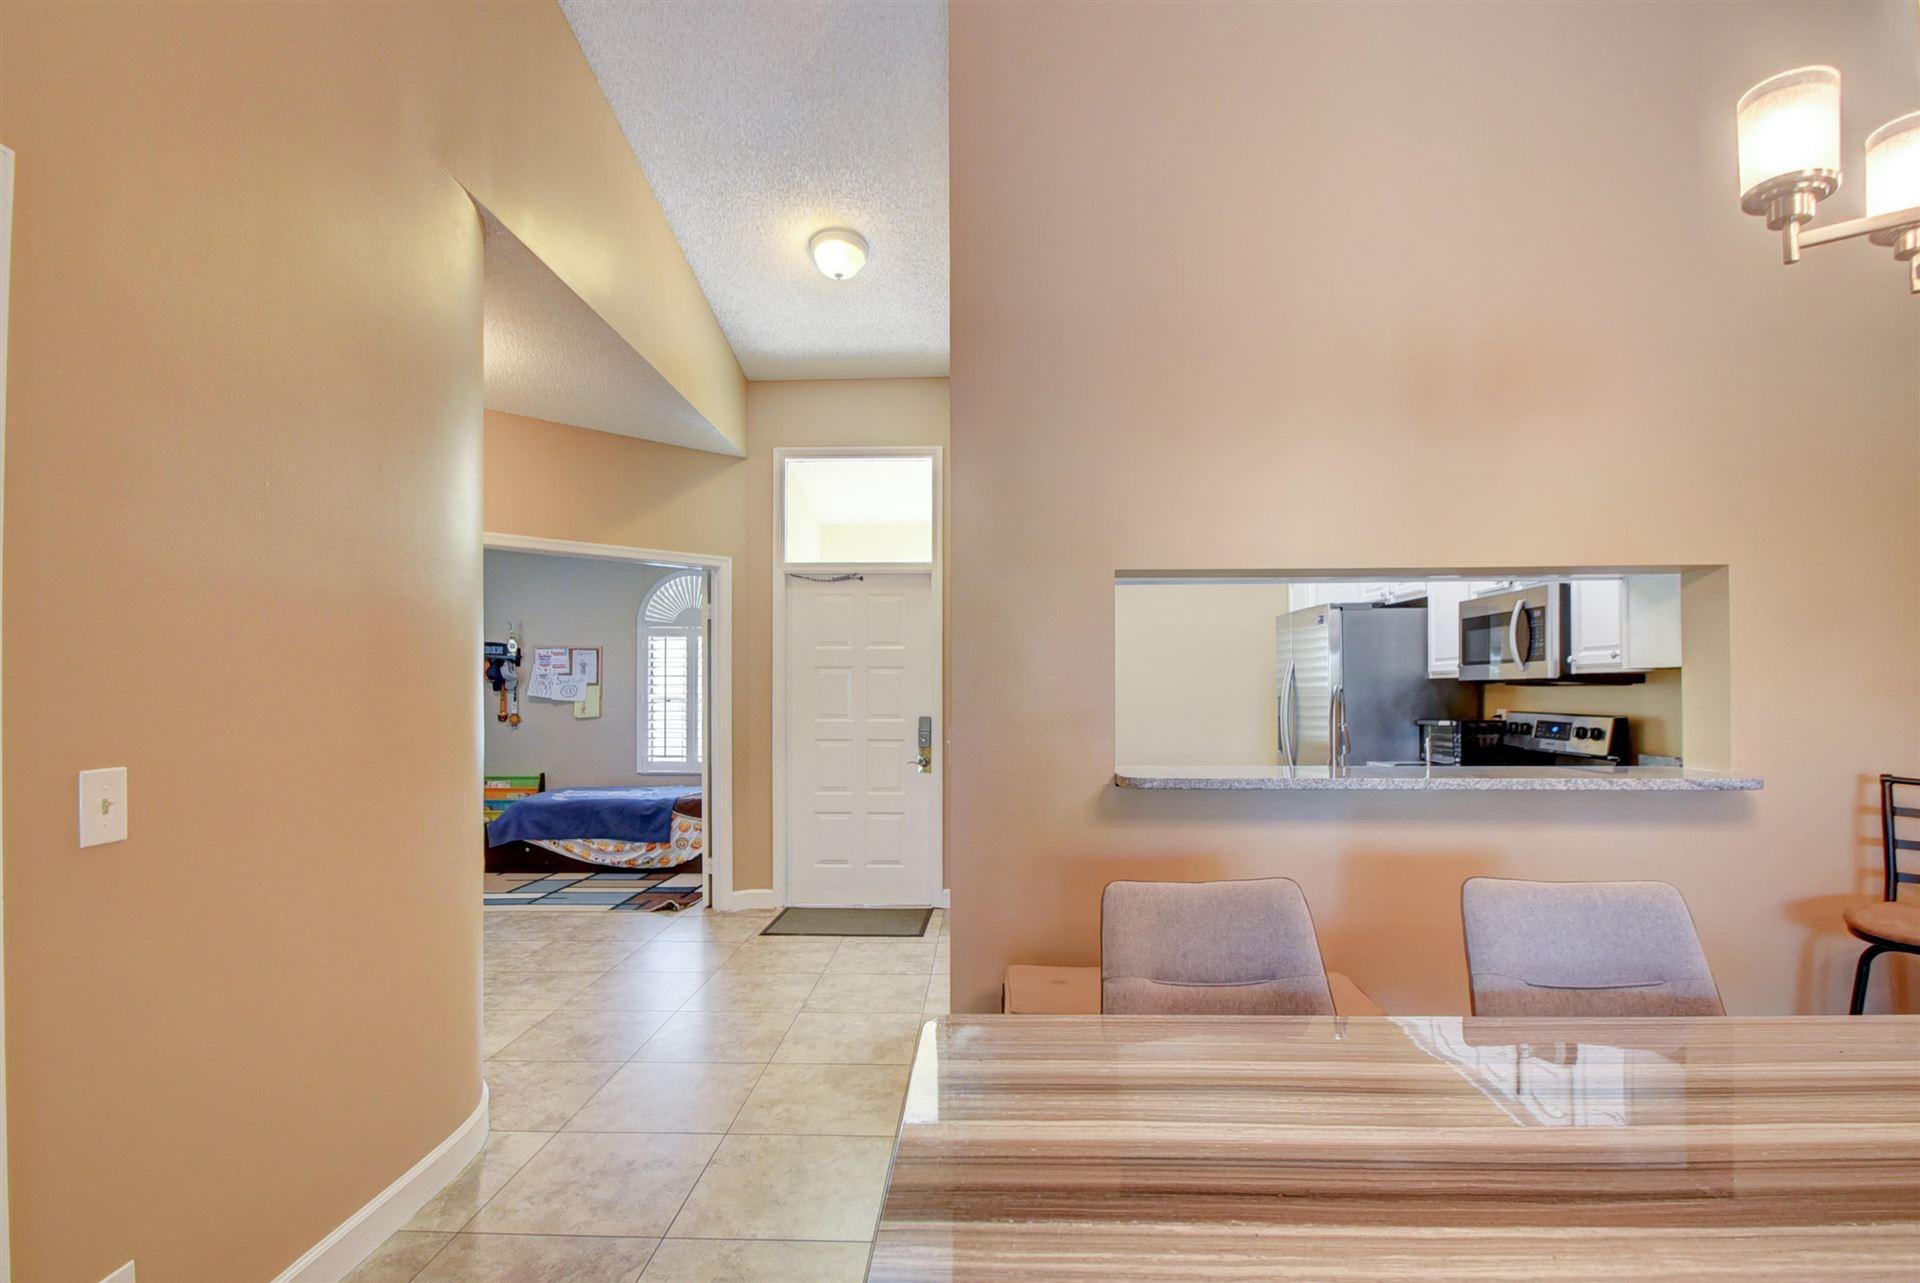 Photo of 200 Cypress Point Drive #200, Palm Beach Gardens, FL 33418 (MLS # RX-10690287)